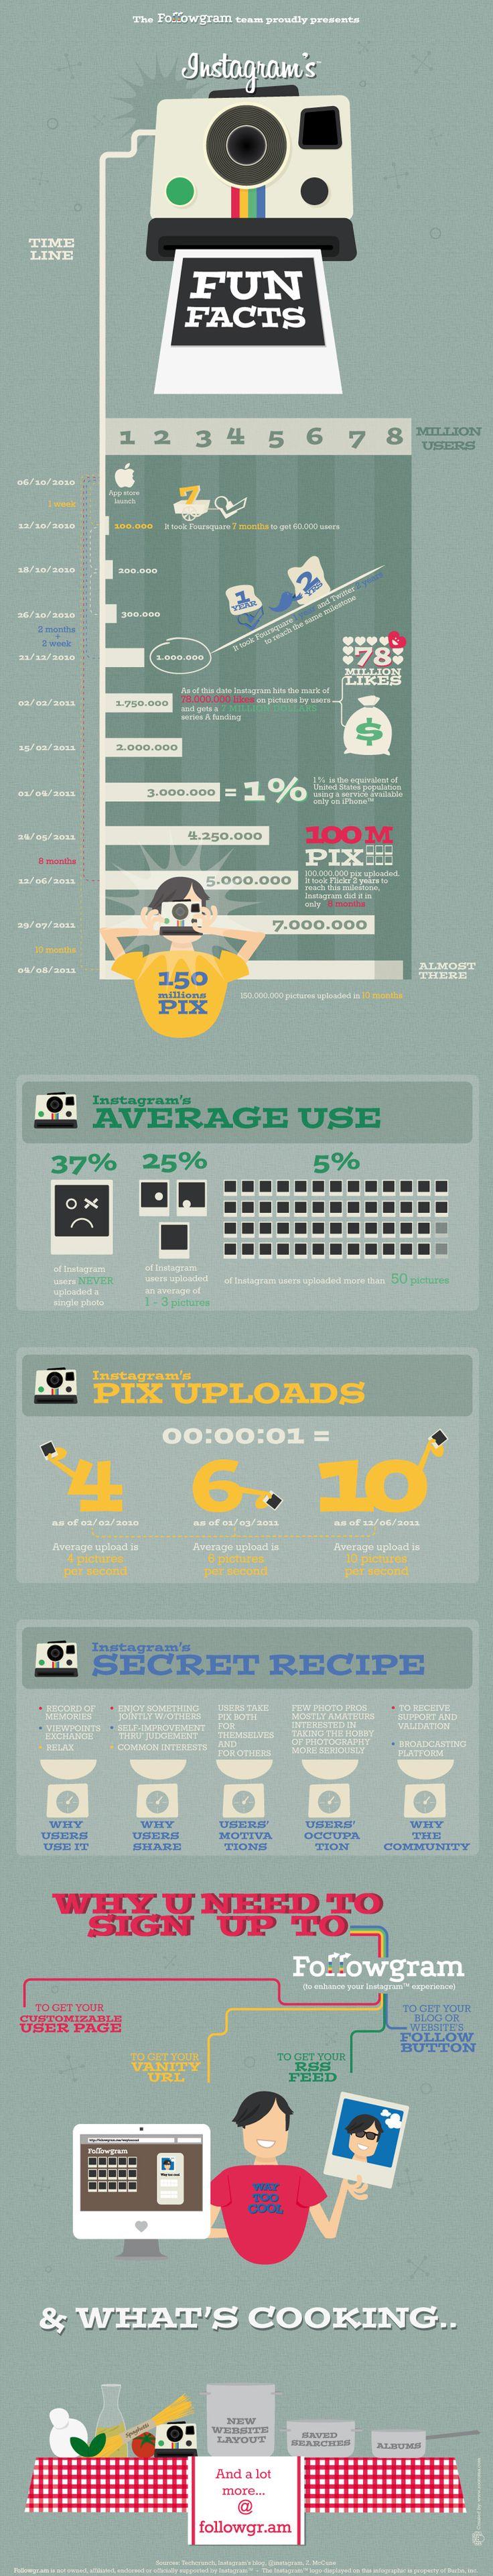 Instagram feiten - #infographic